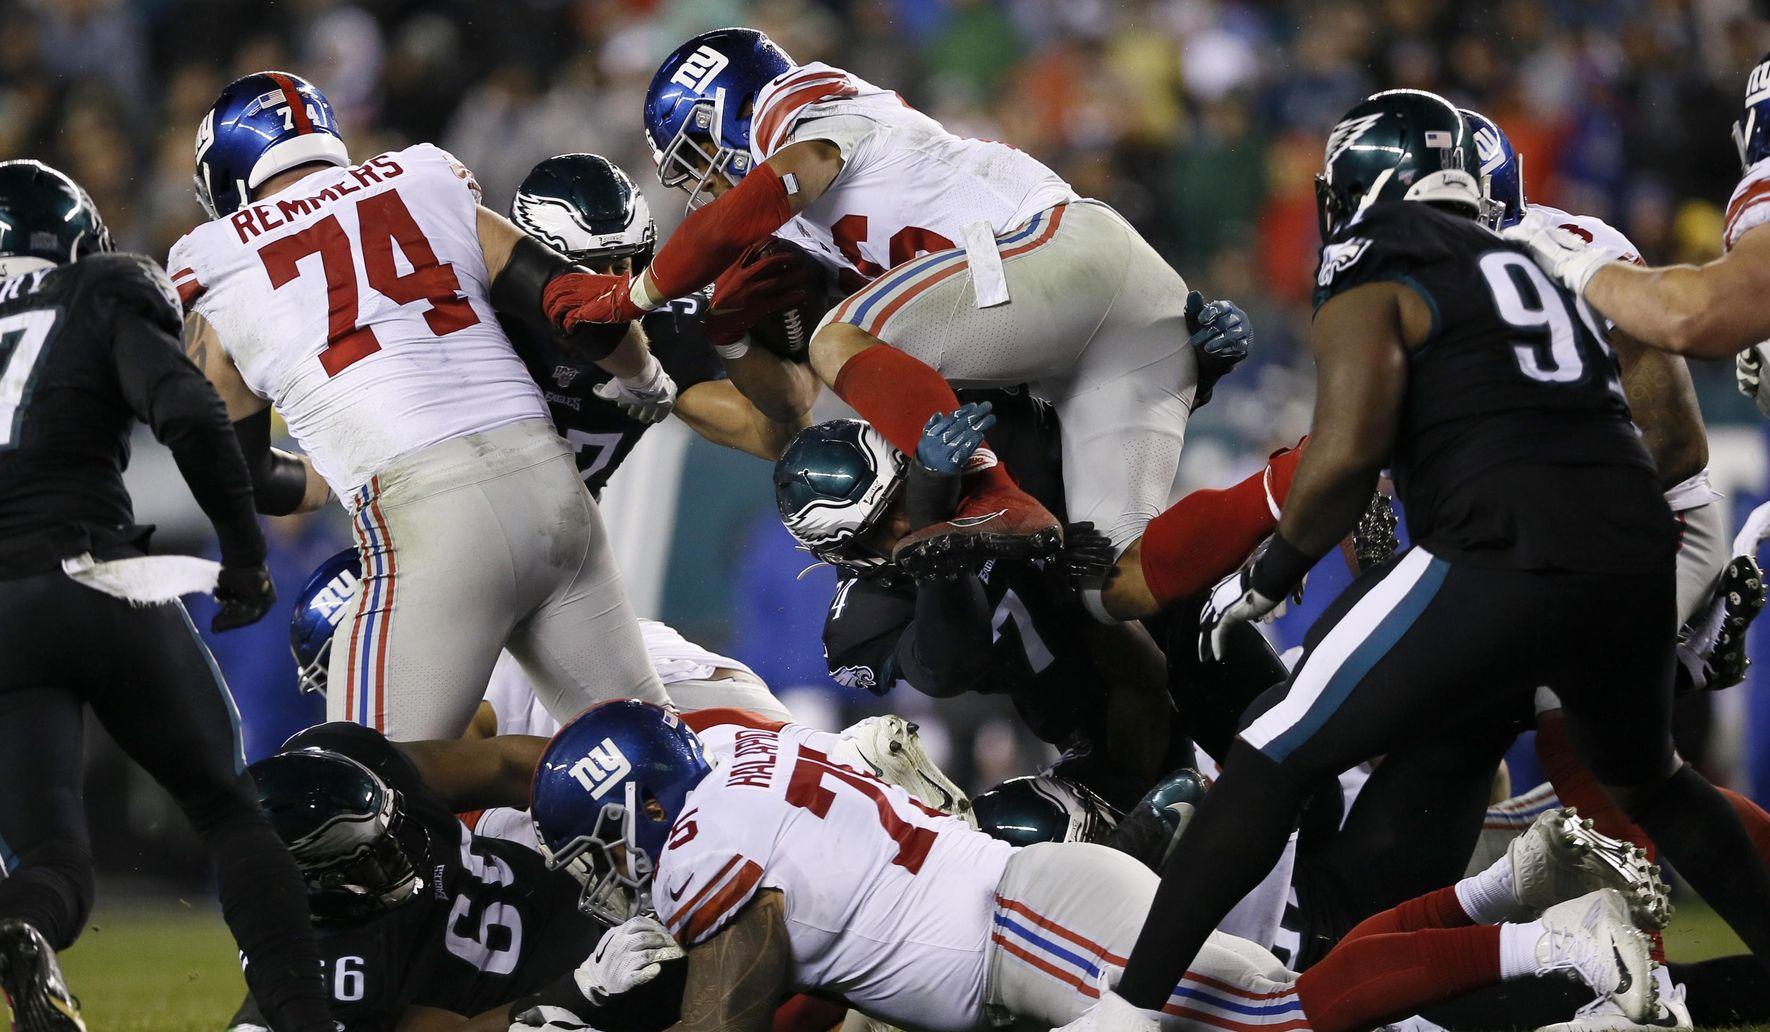 Giants_eagles_football_18508_c0-139-3322-2075_s1770x1032